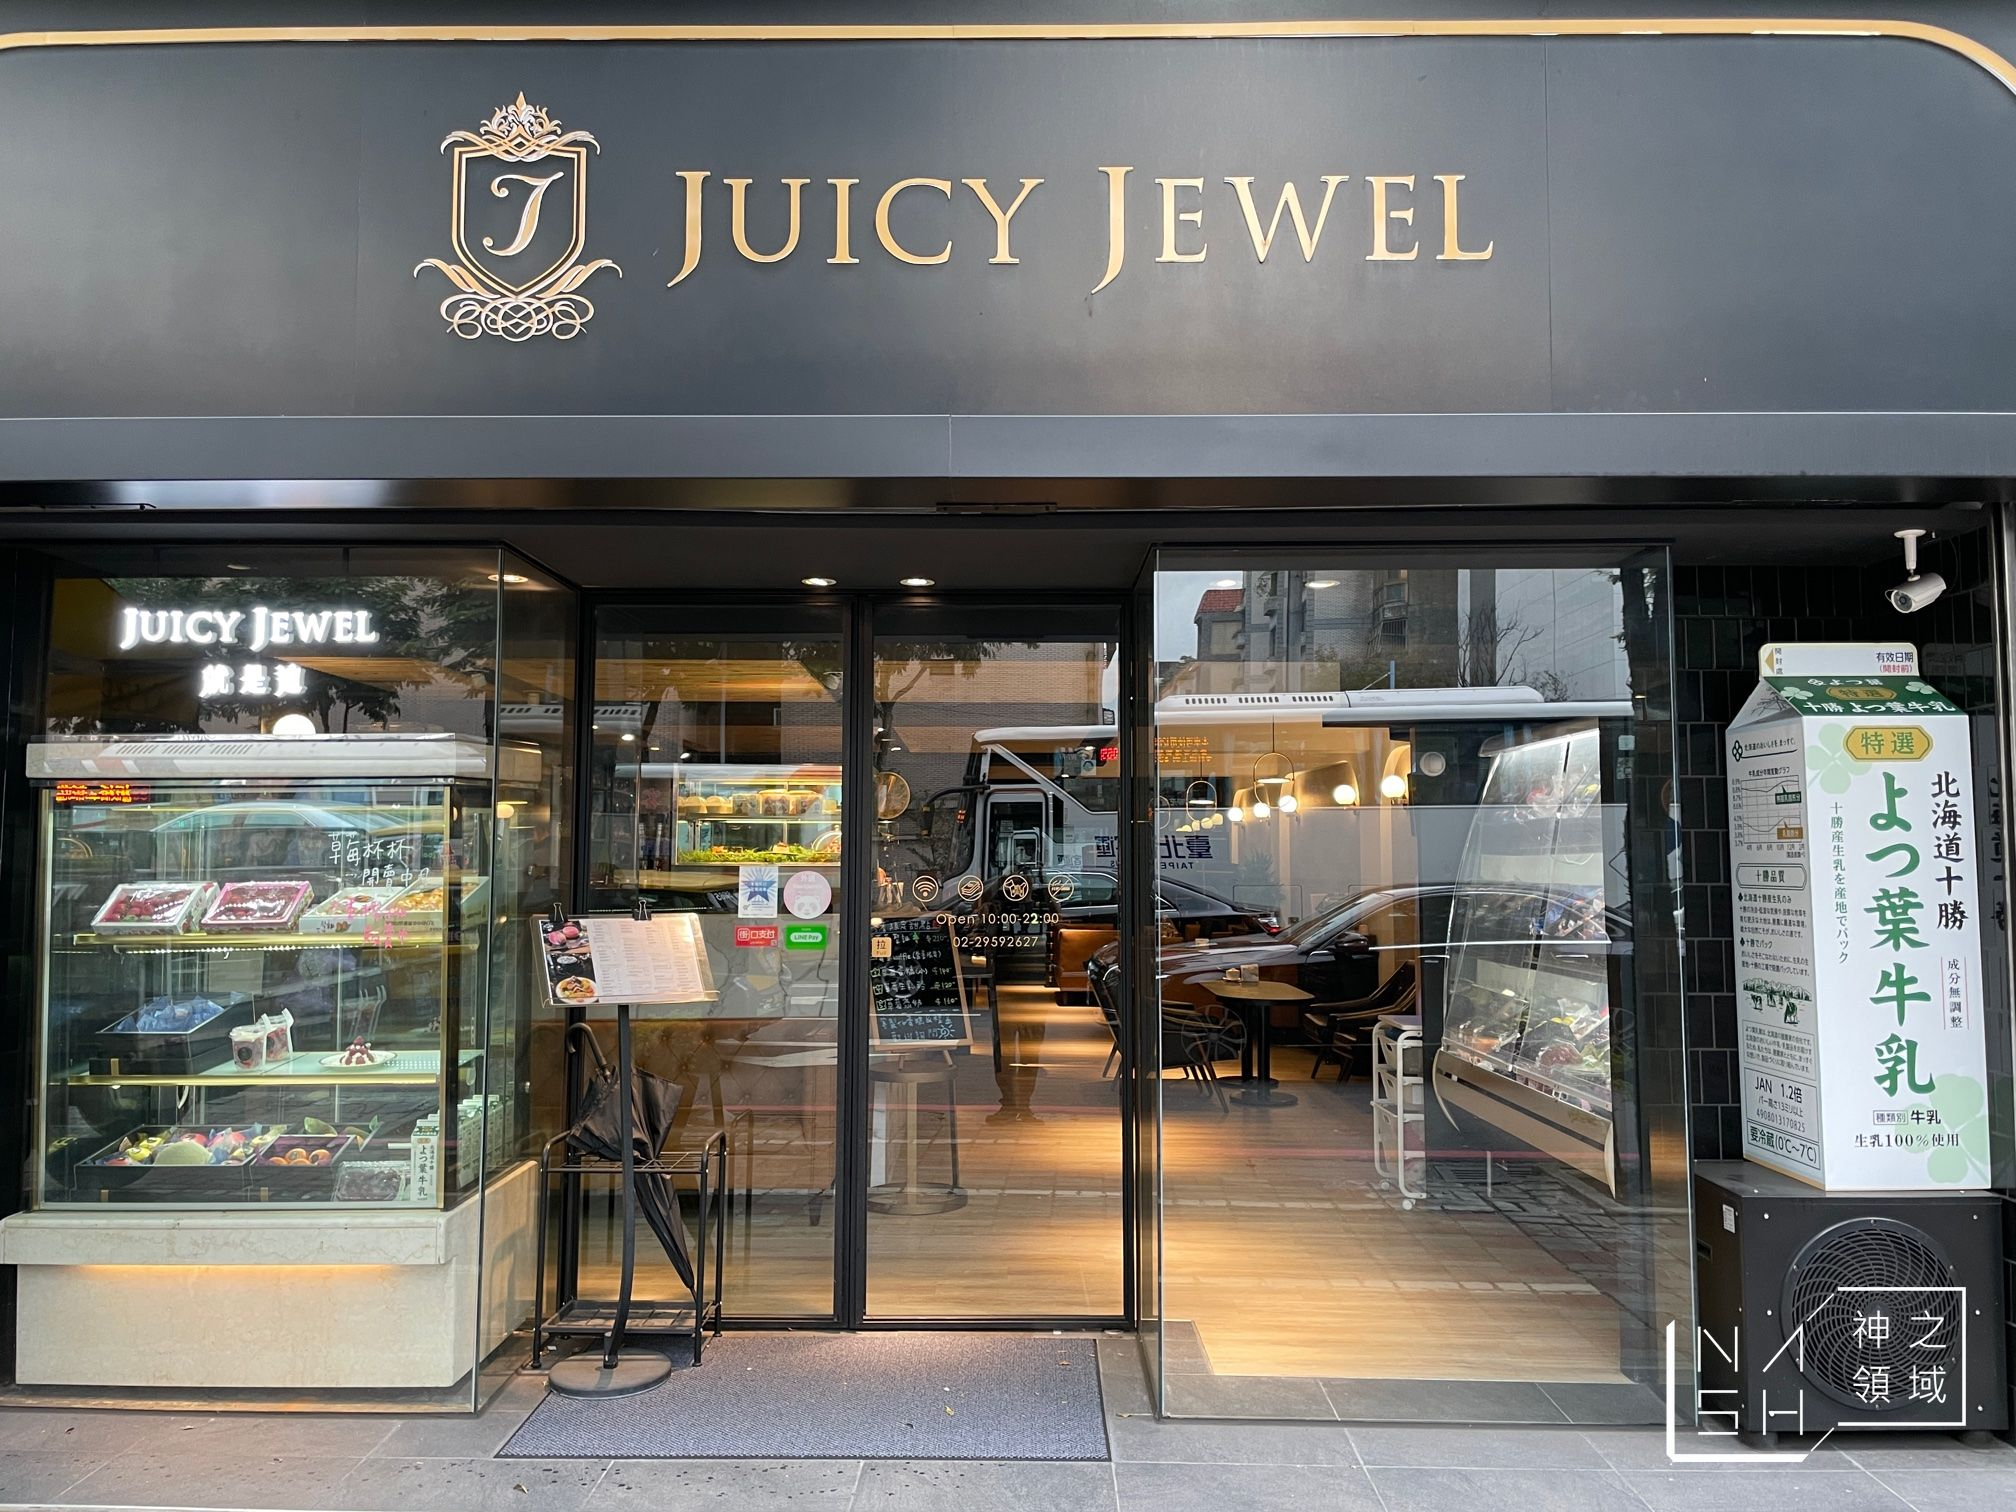 JUICY JEWEL